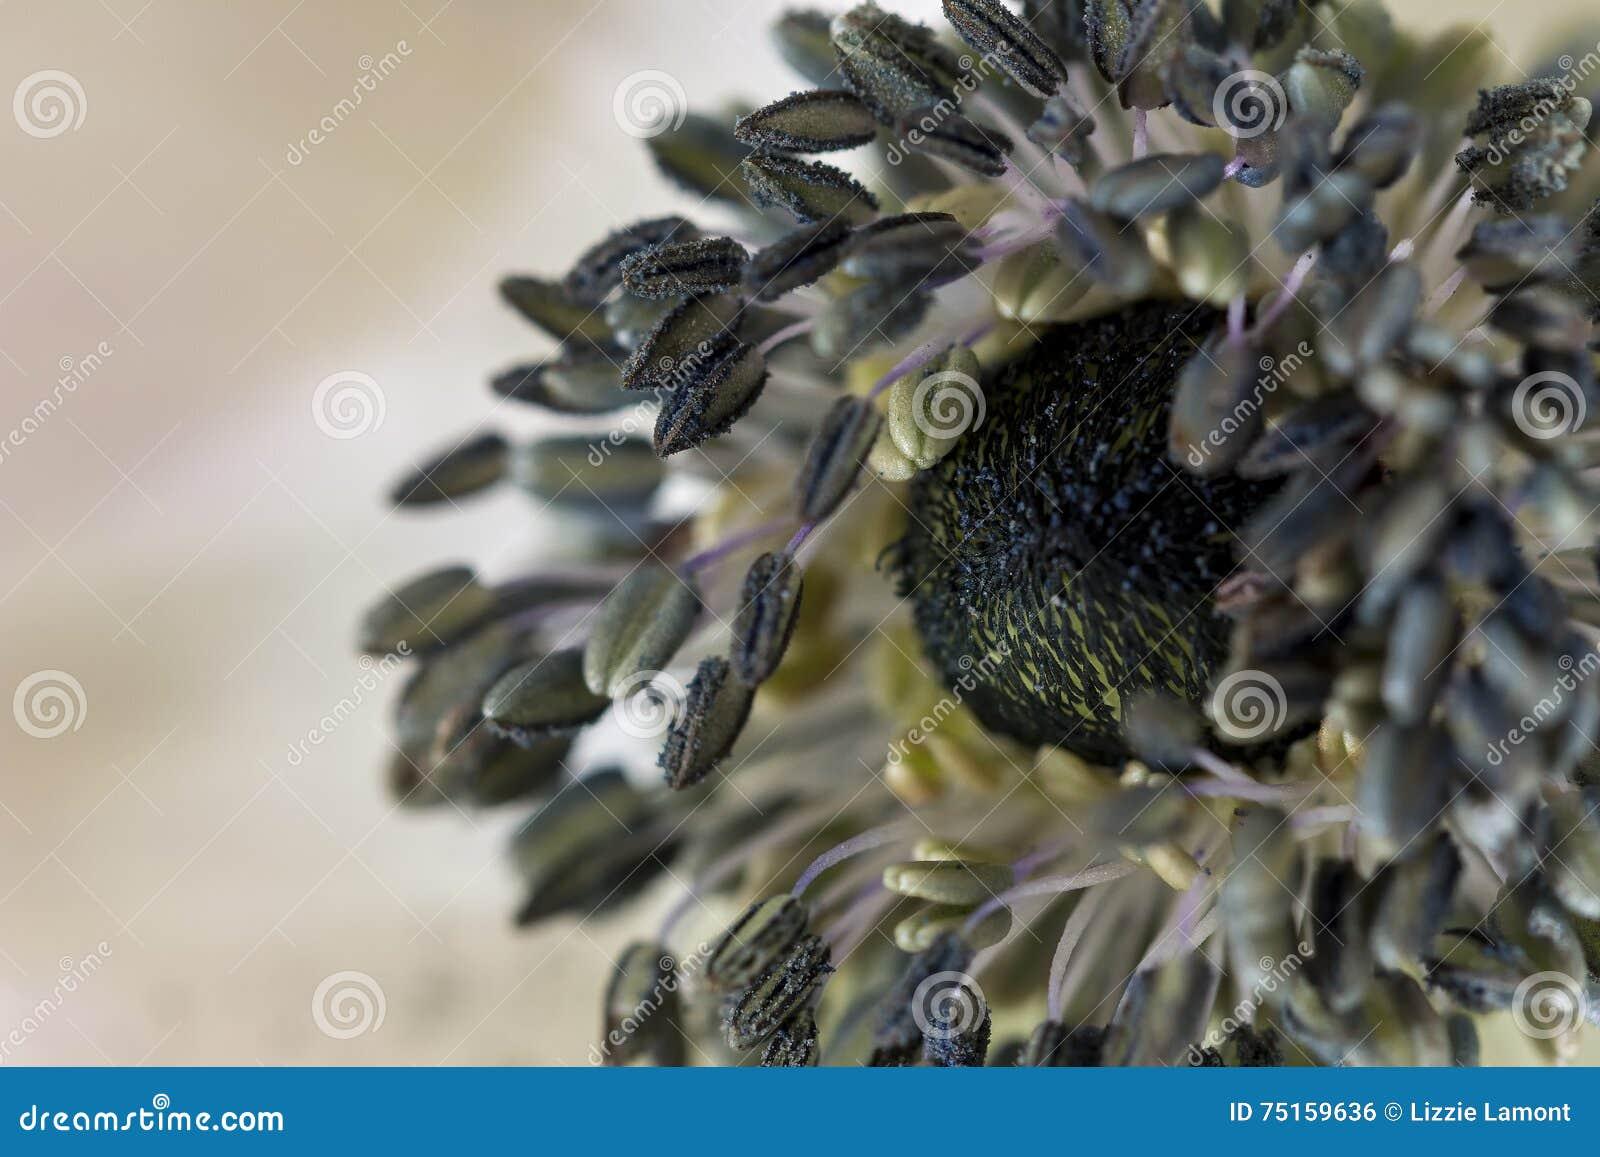 Anemone Centre Stock Photo Image Of Perfect Black Near 75159636